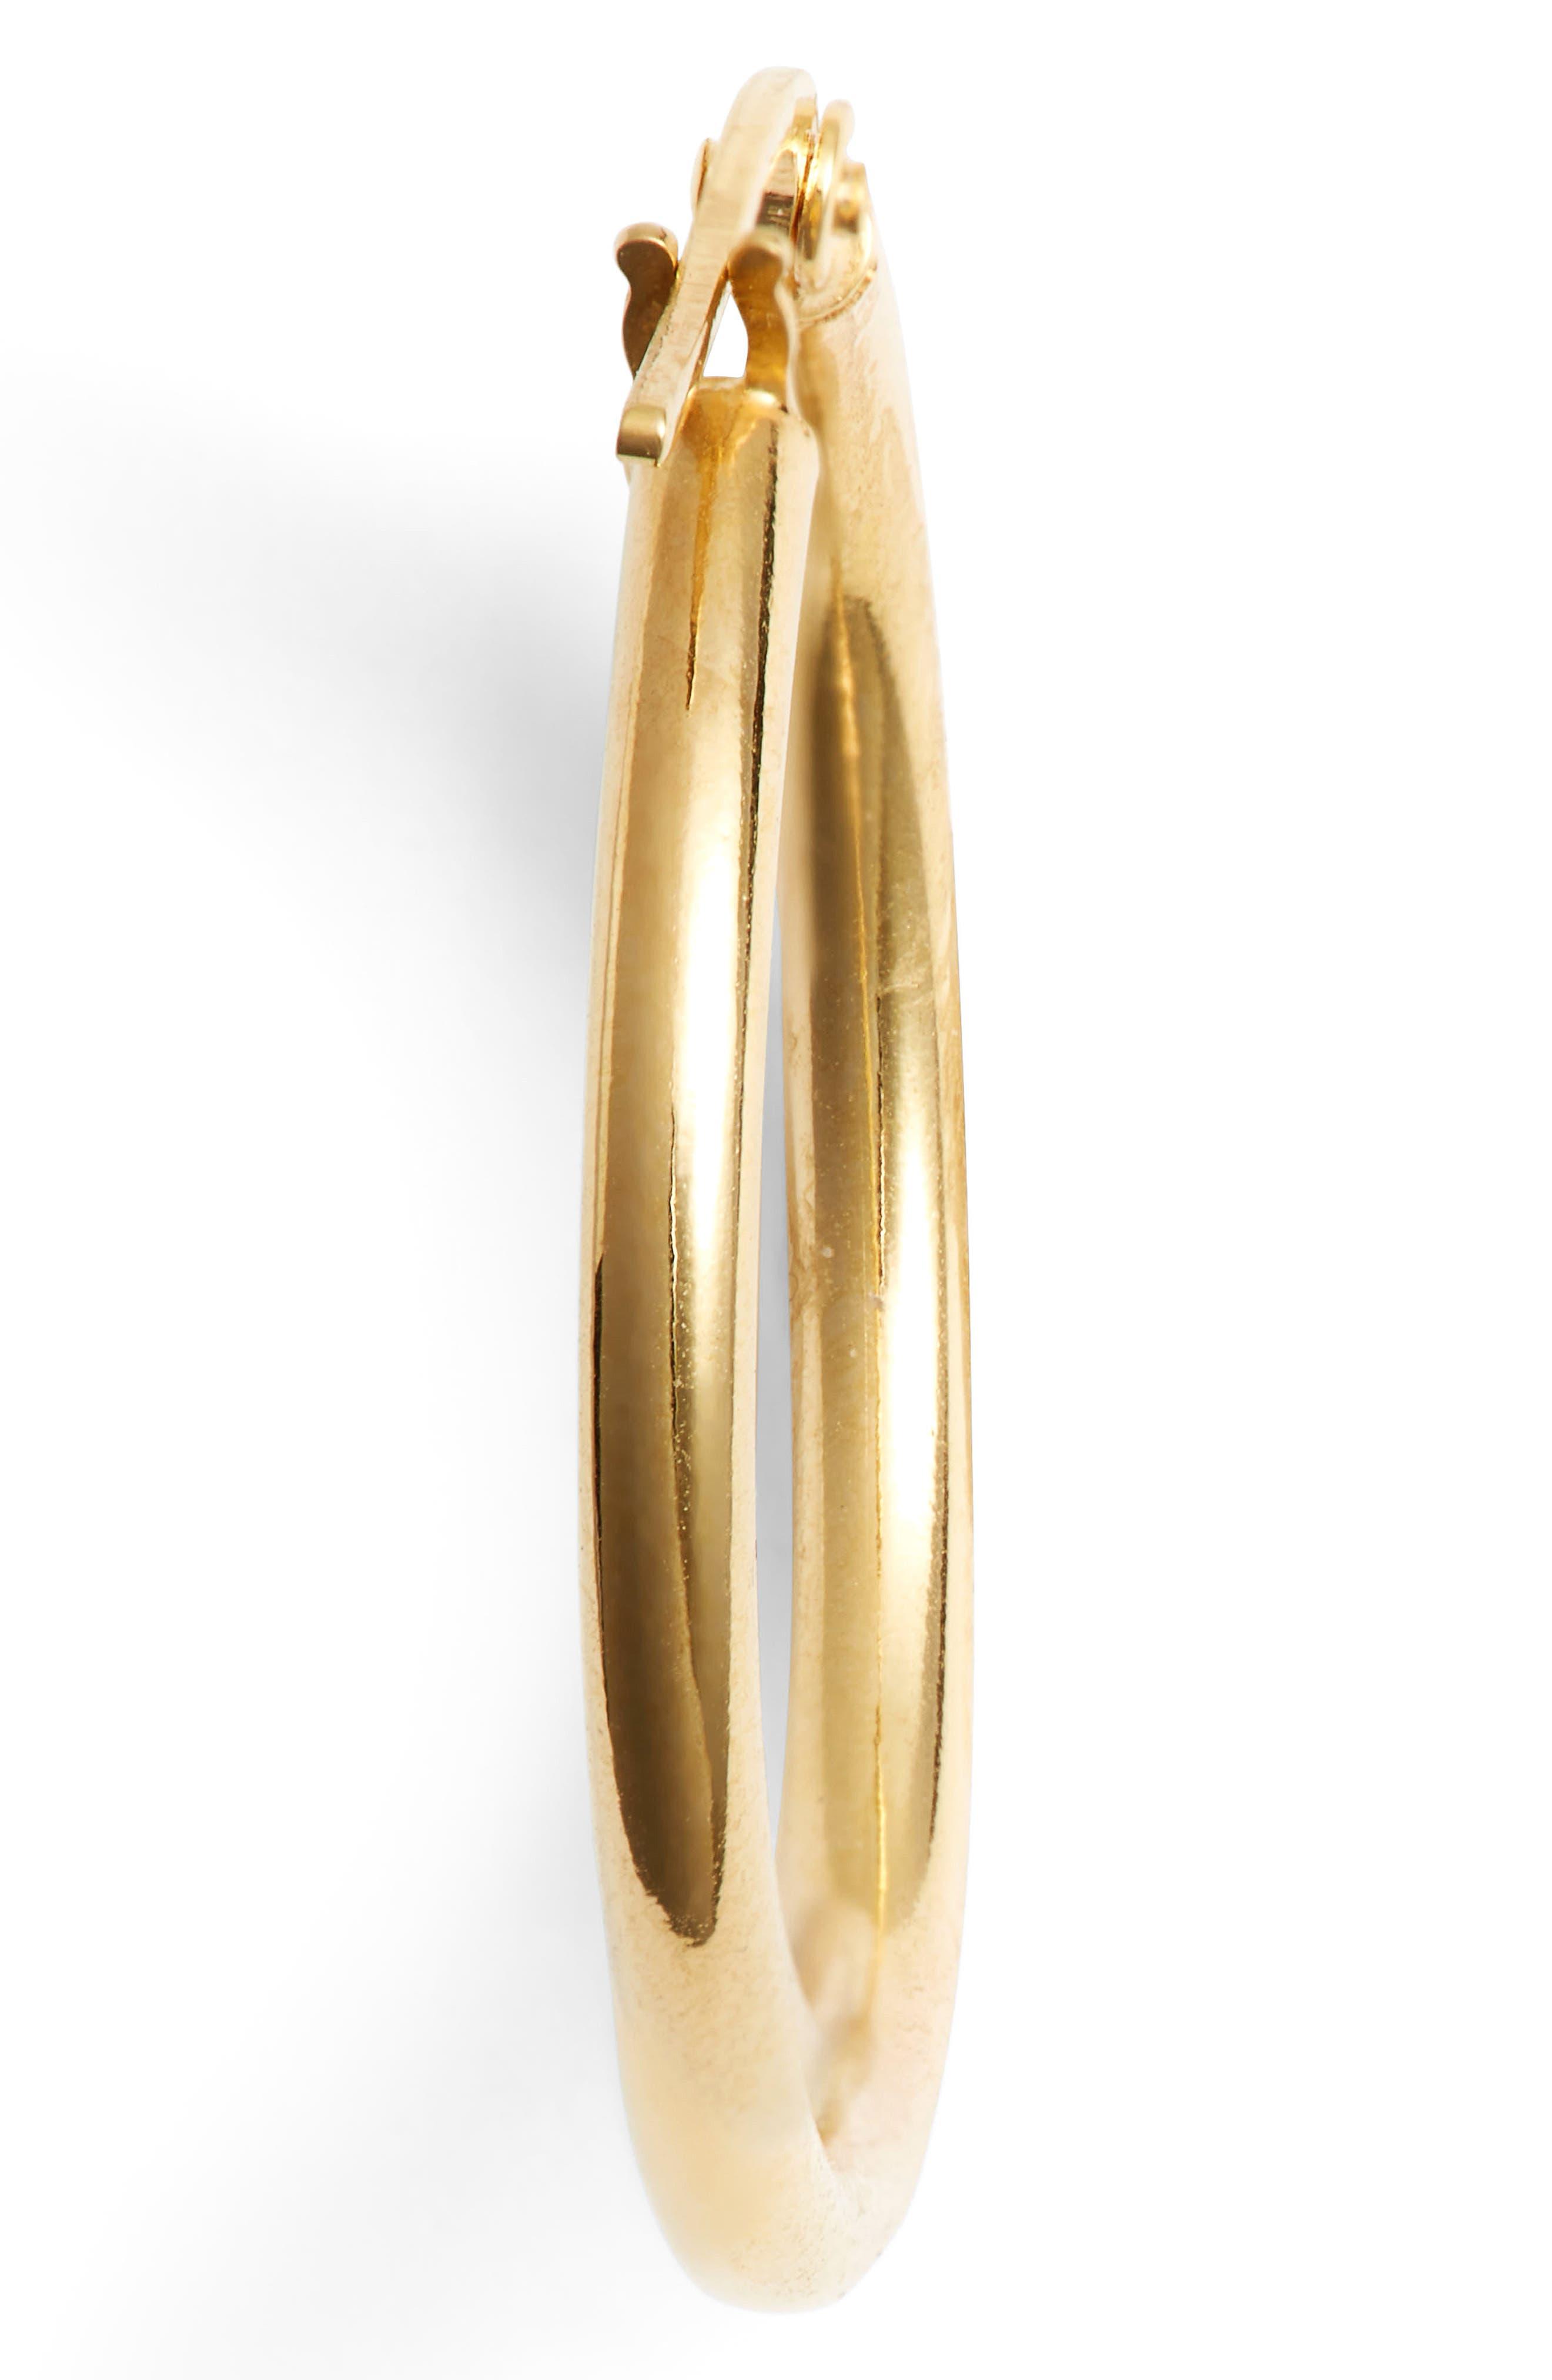 14k Gold Hoop Earrings,                             Alternate thumbnail 4, color,                             YELLOW GOLD